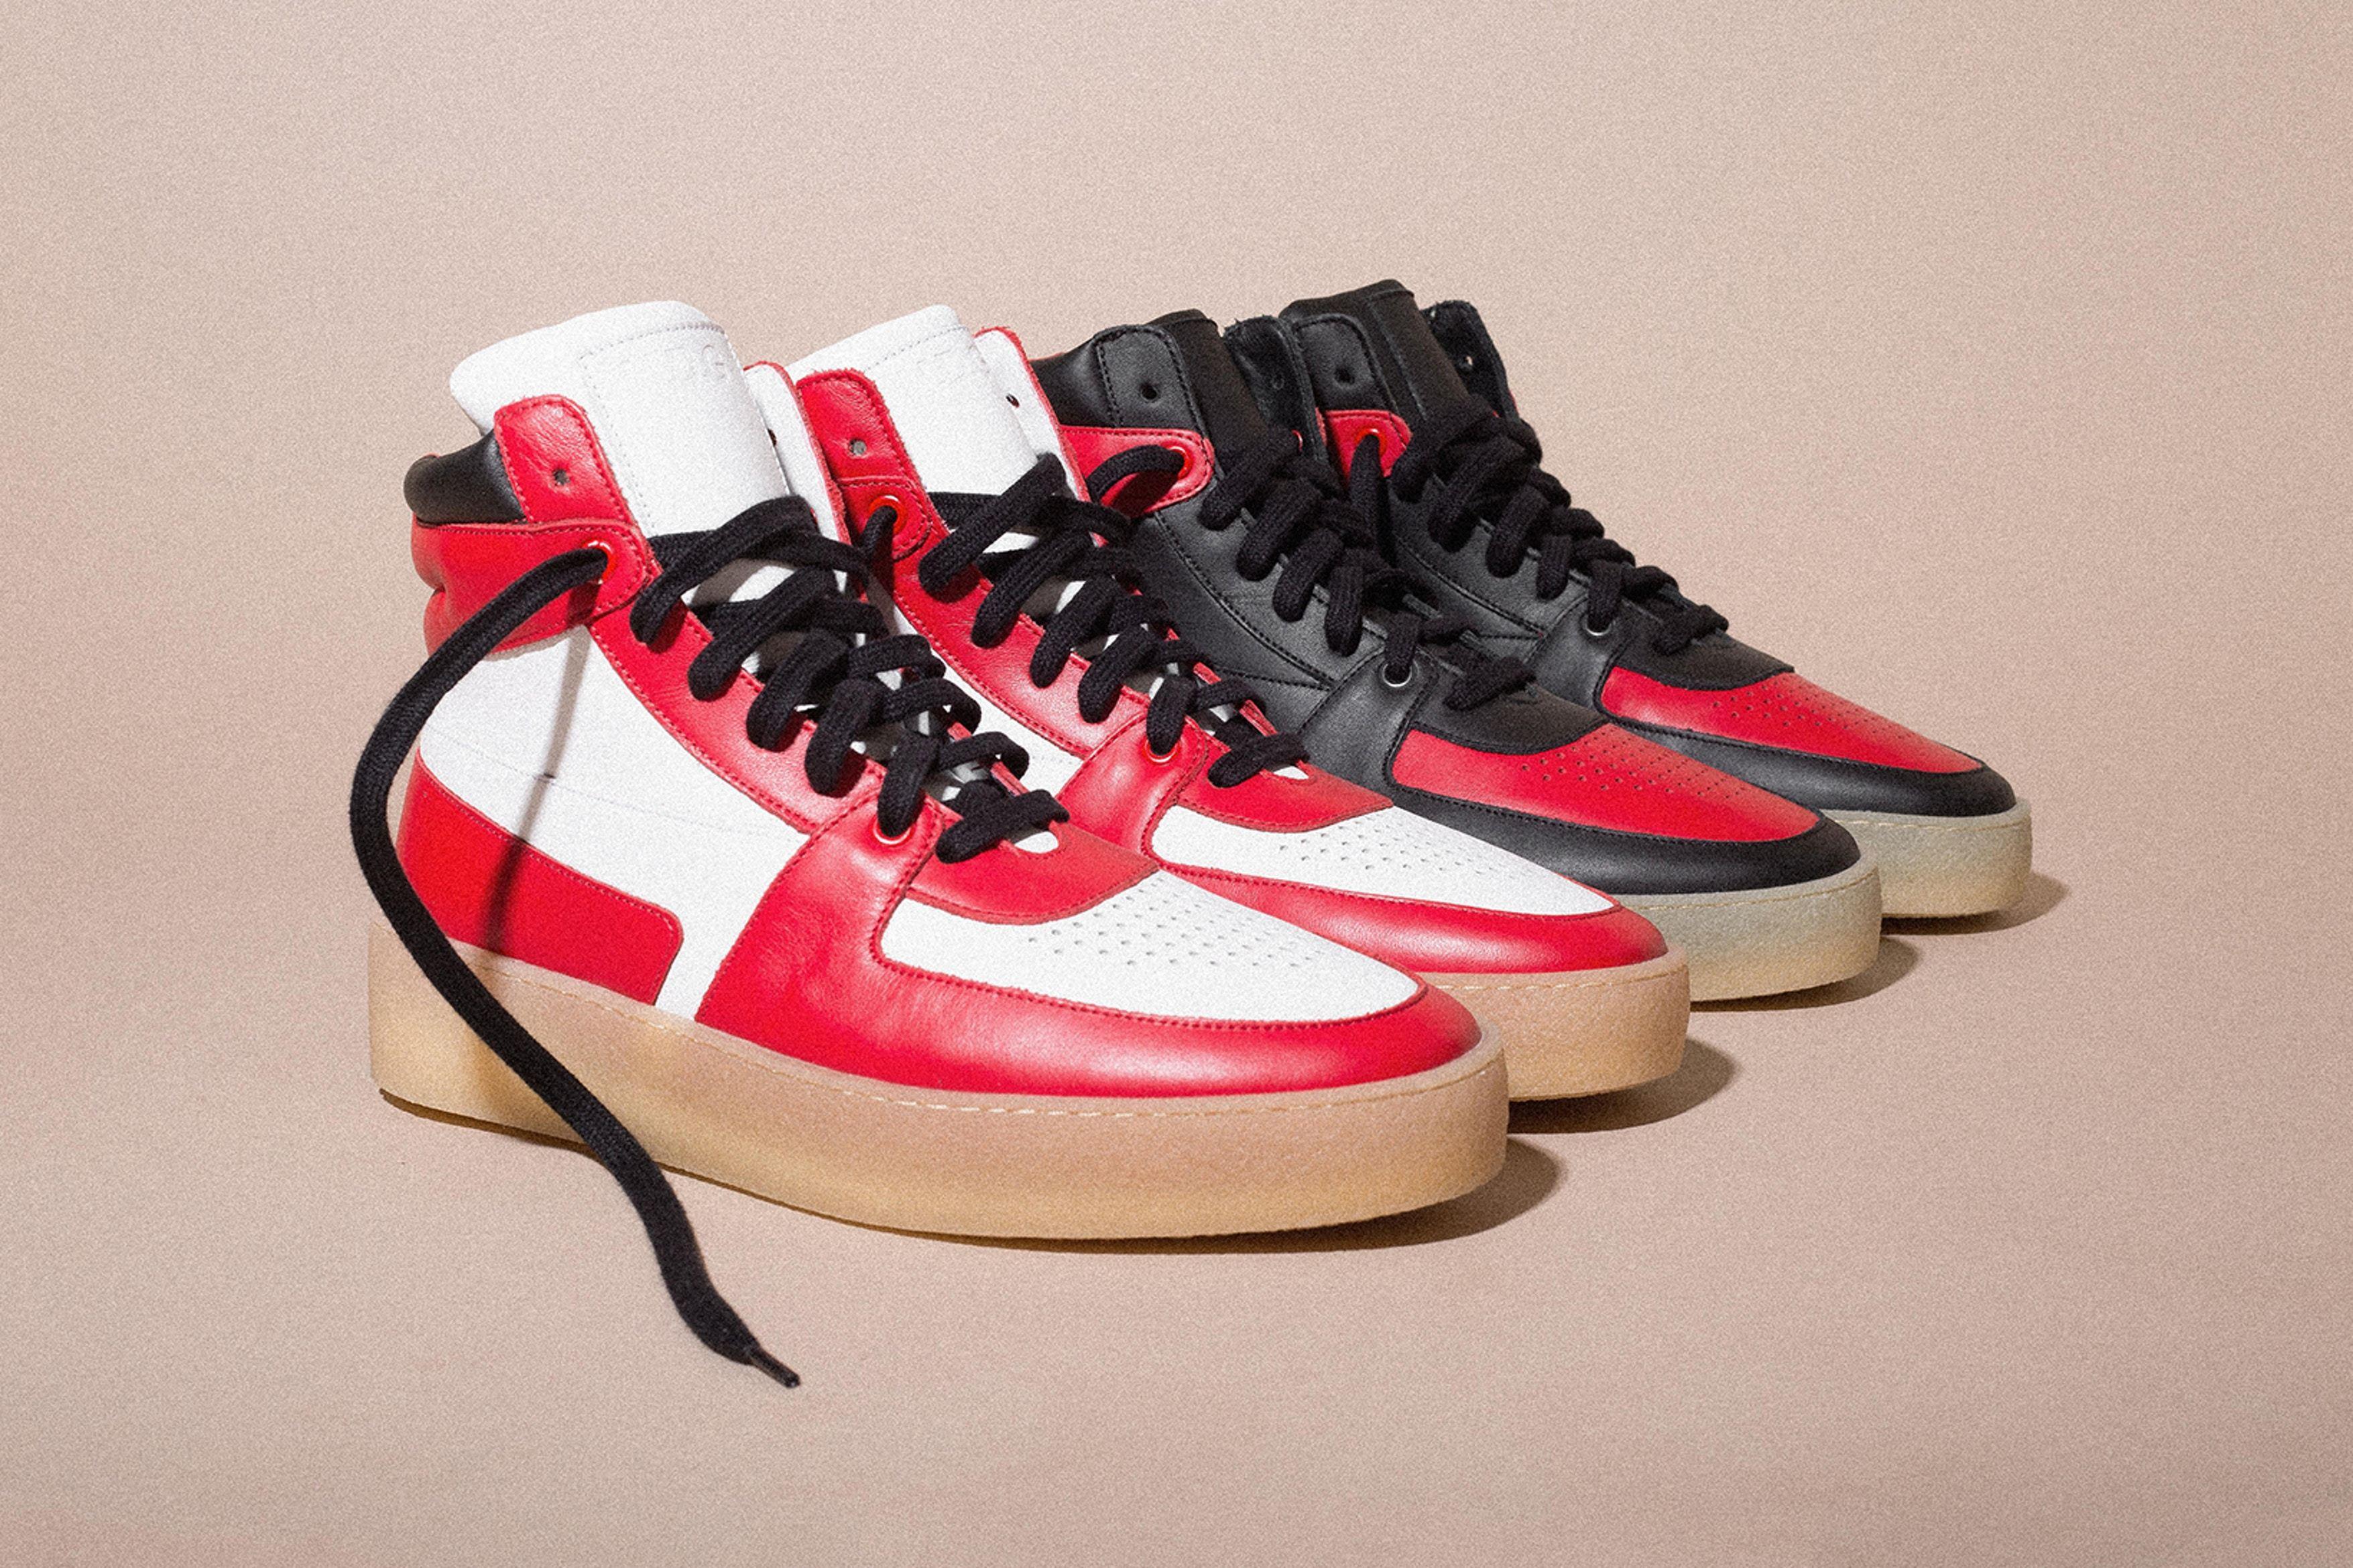 Ndg Studio 1984 Sneaker Gum Sole Pack 1 Sneaker Freaker